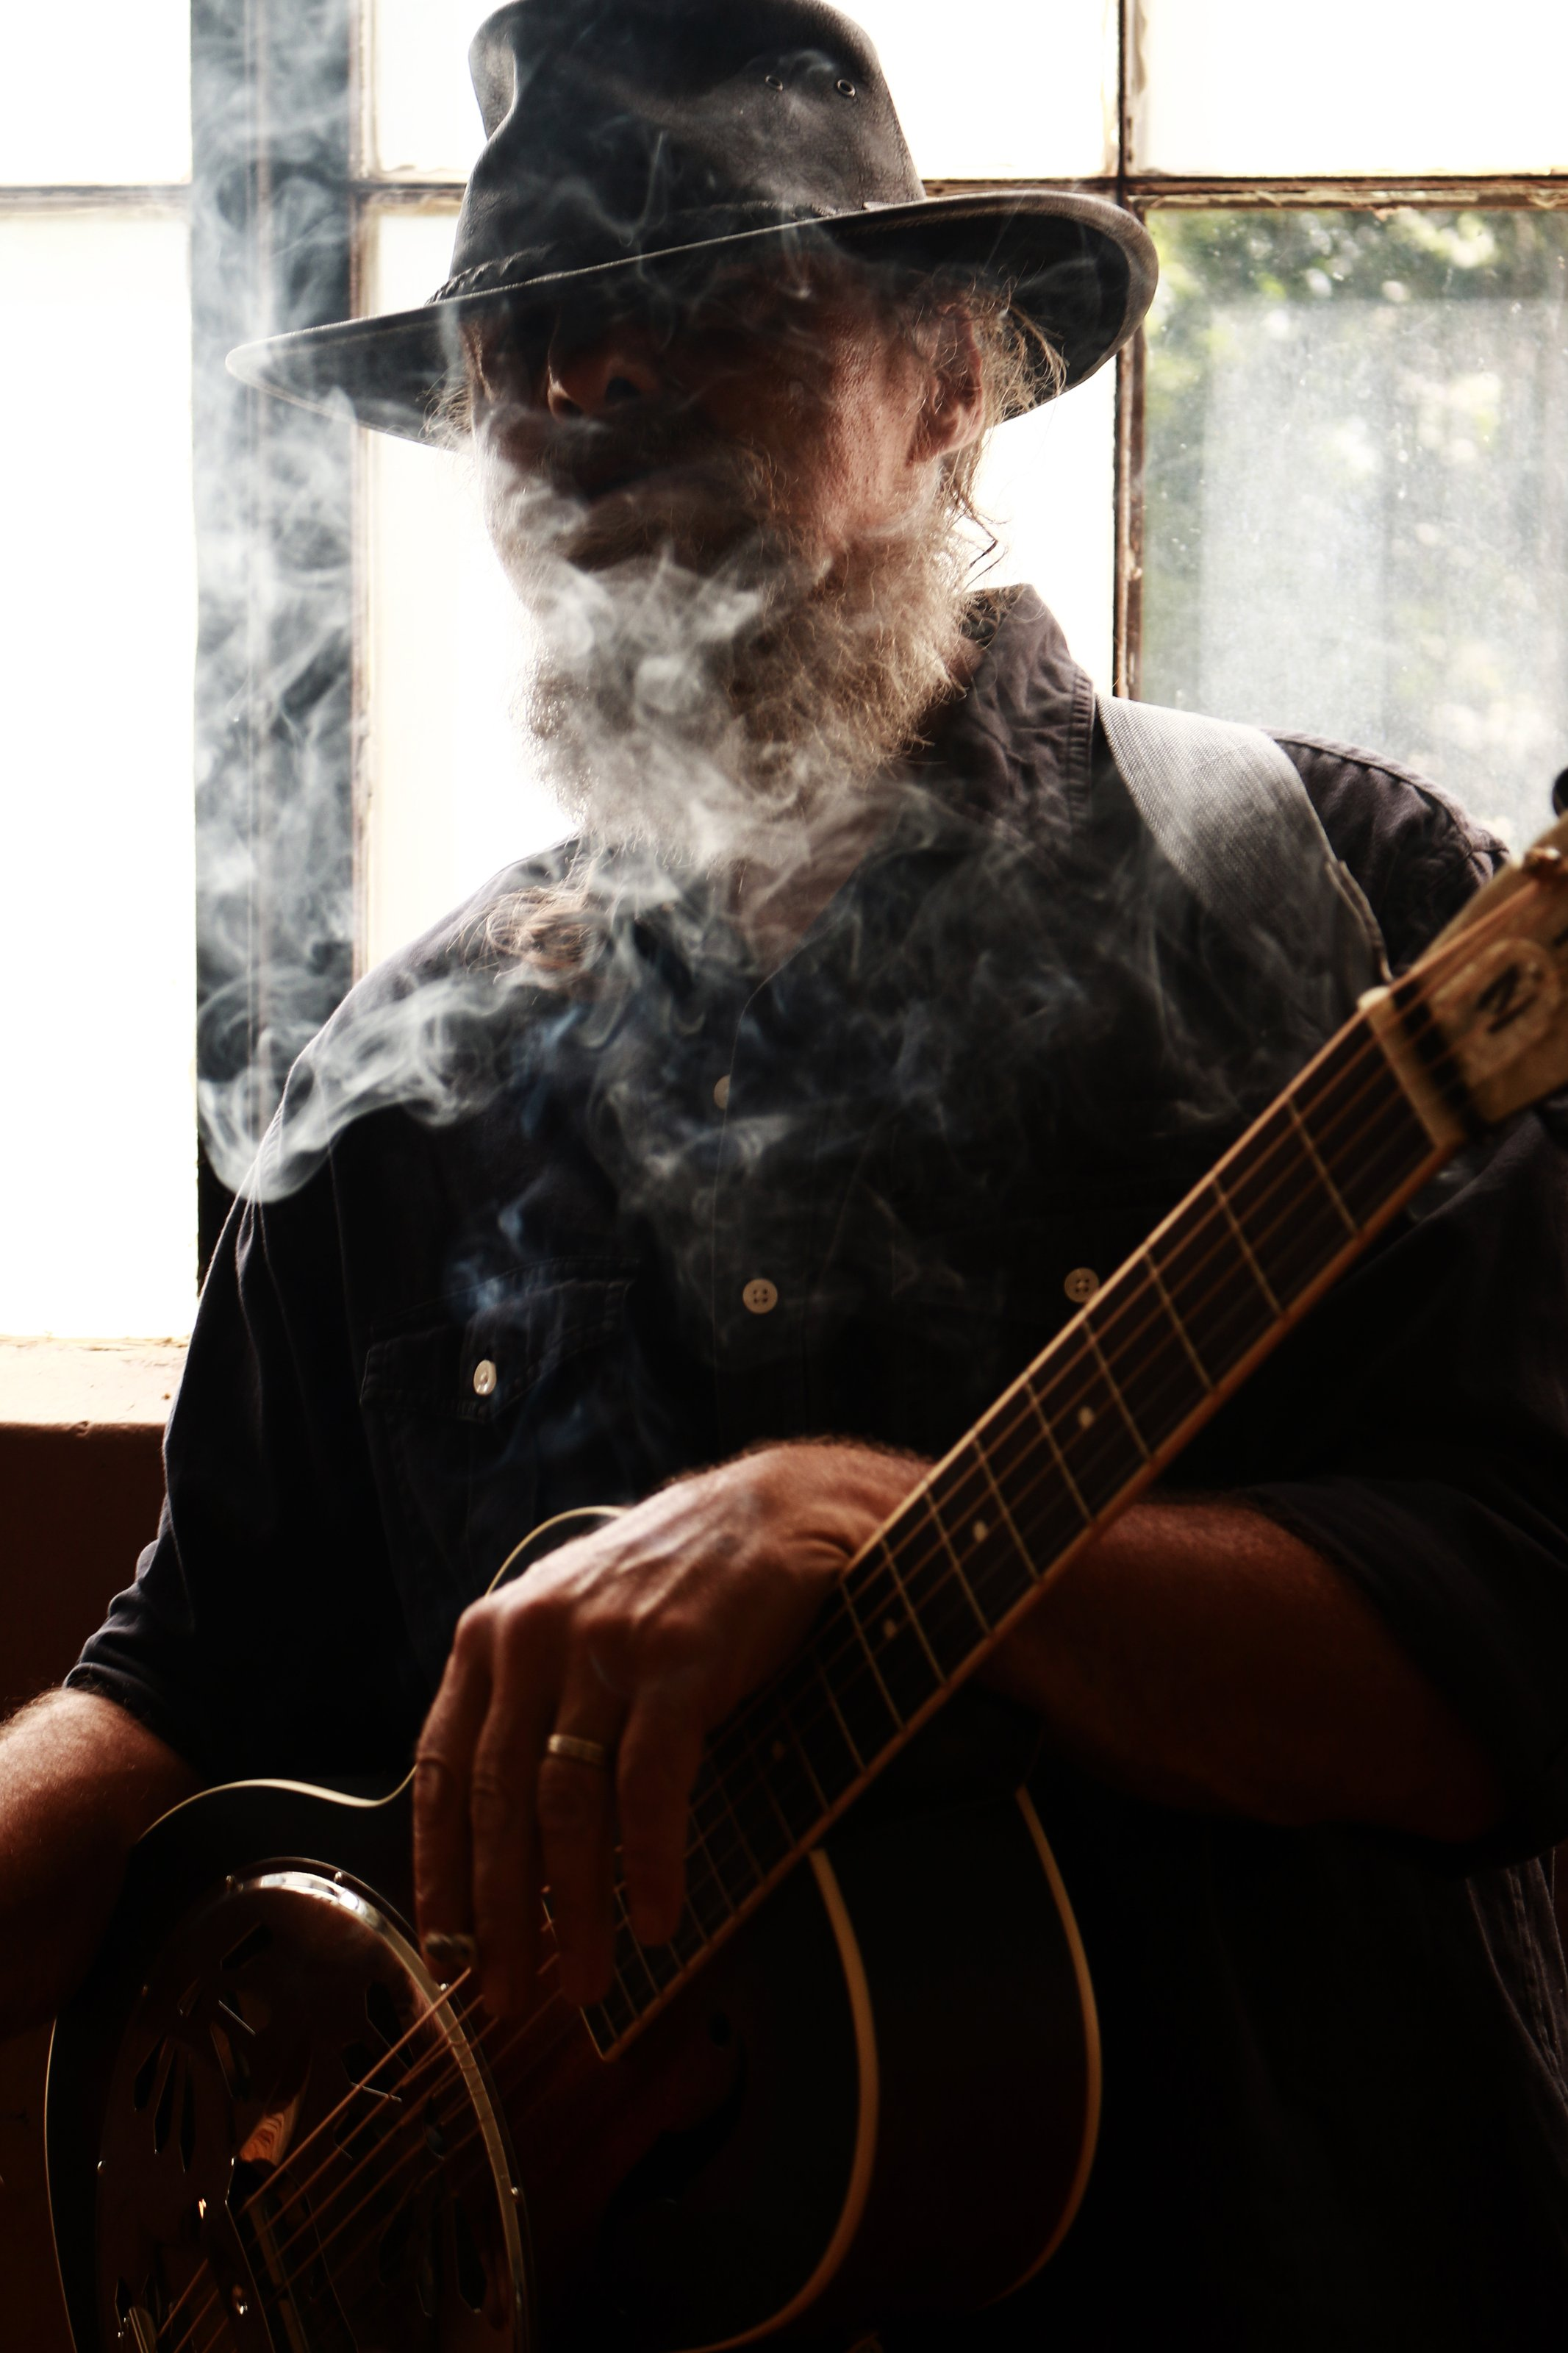 smoke_in_face.jpg